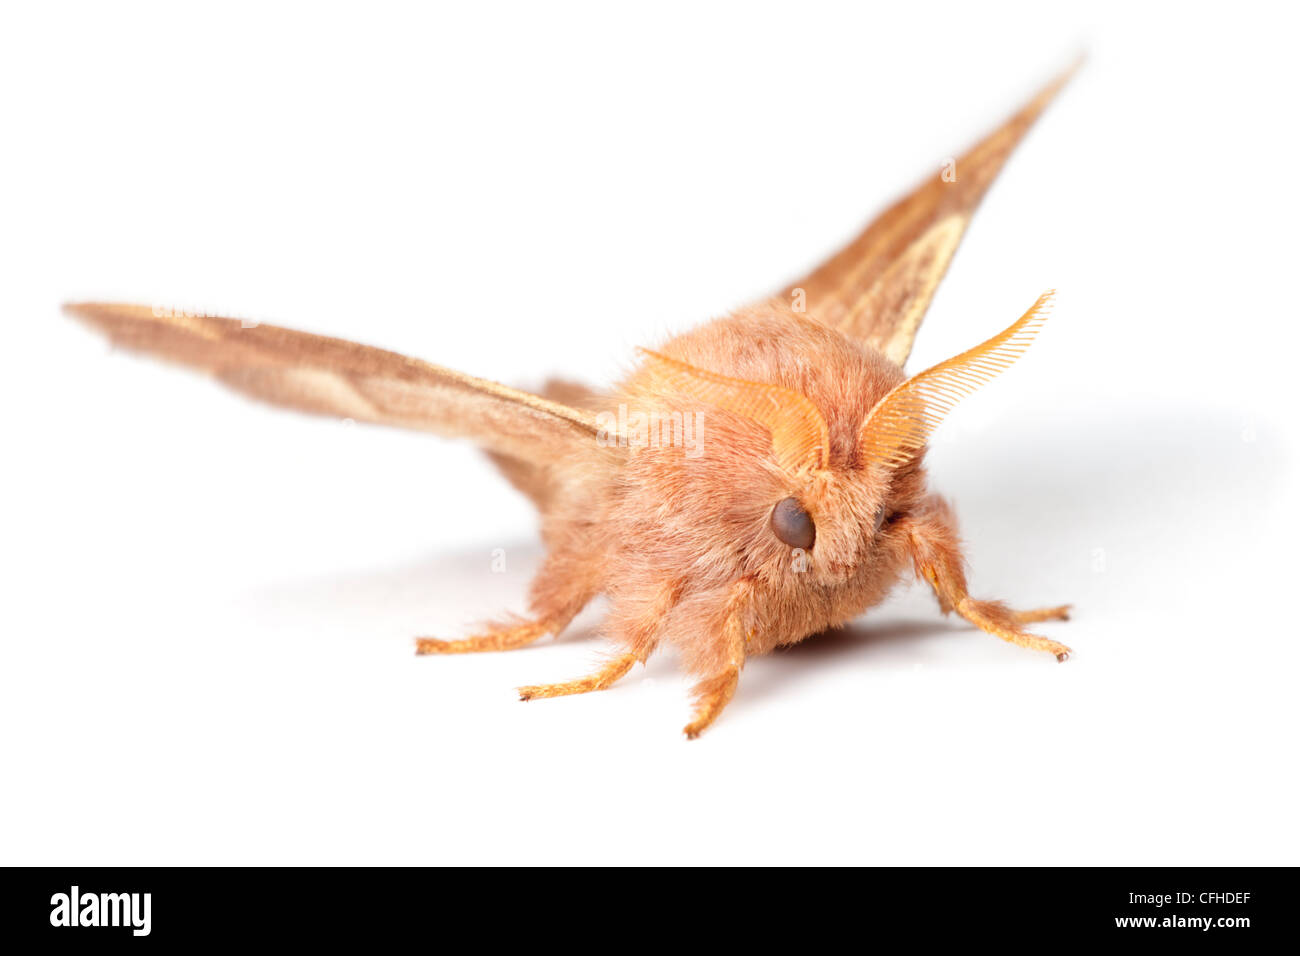 Lackey moth photographed on a white background. Pembrokeshire, UK. July. - Stock Image